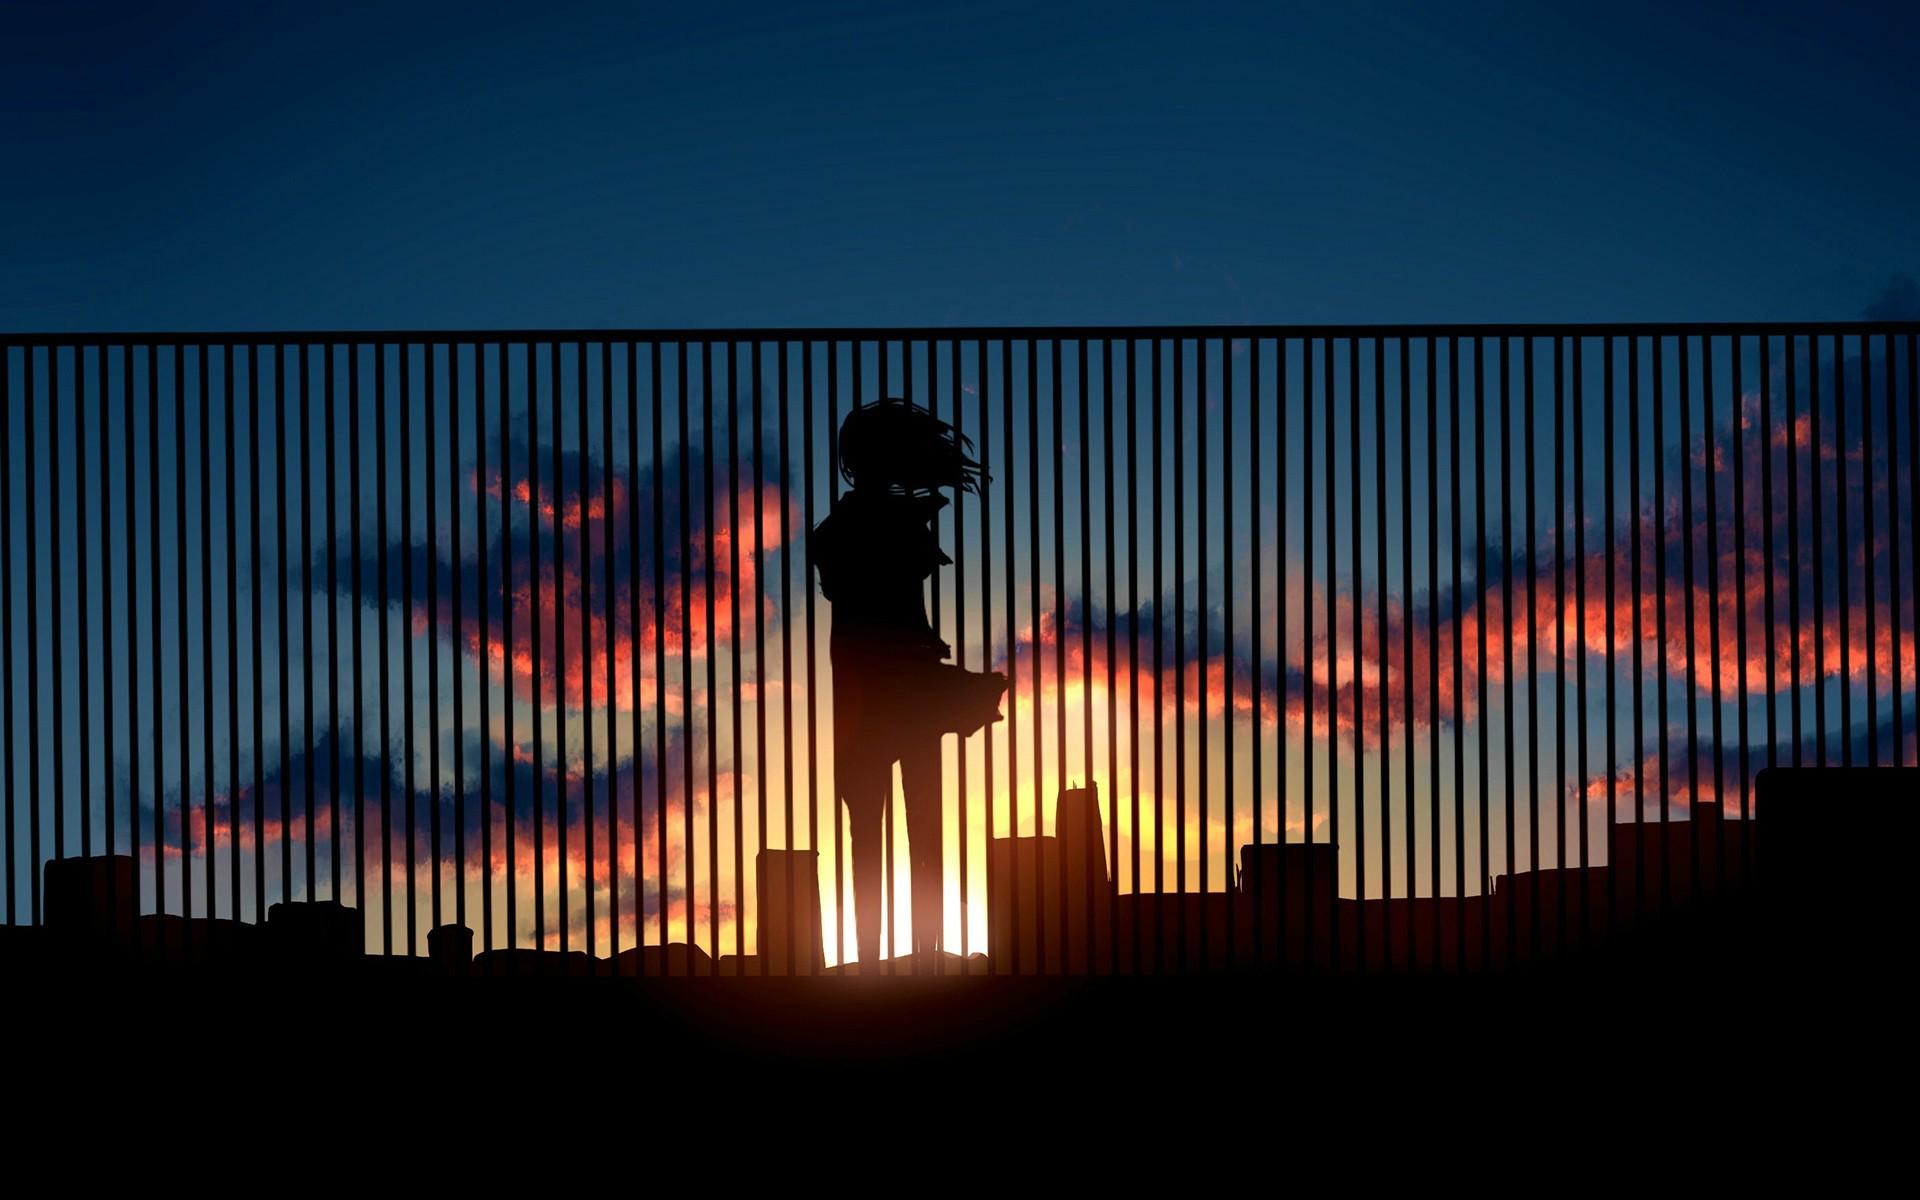 more discrete anime wallpapers Album on Imgur